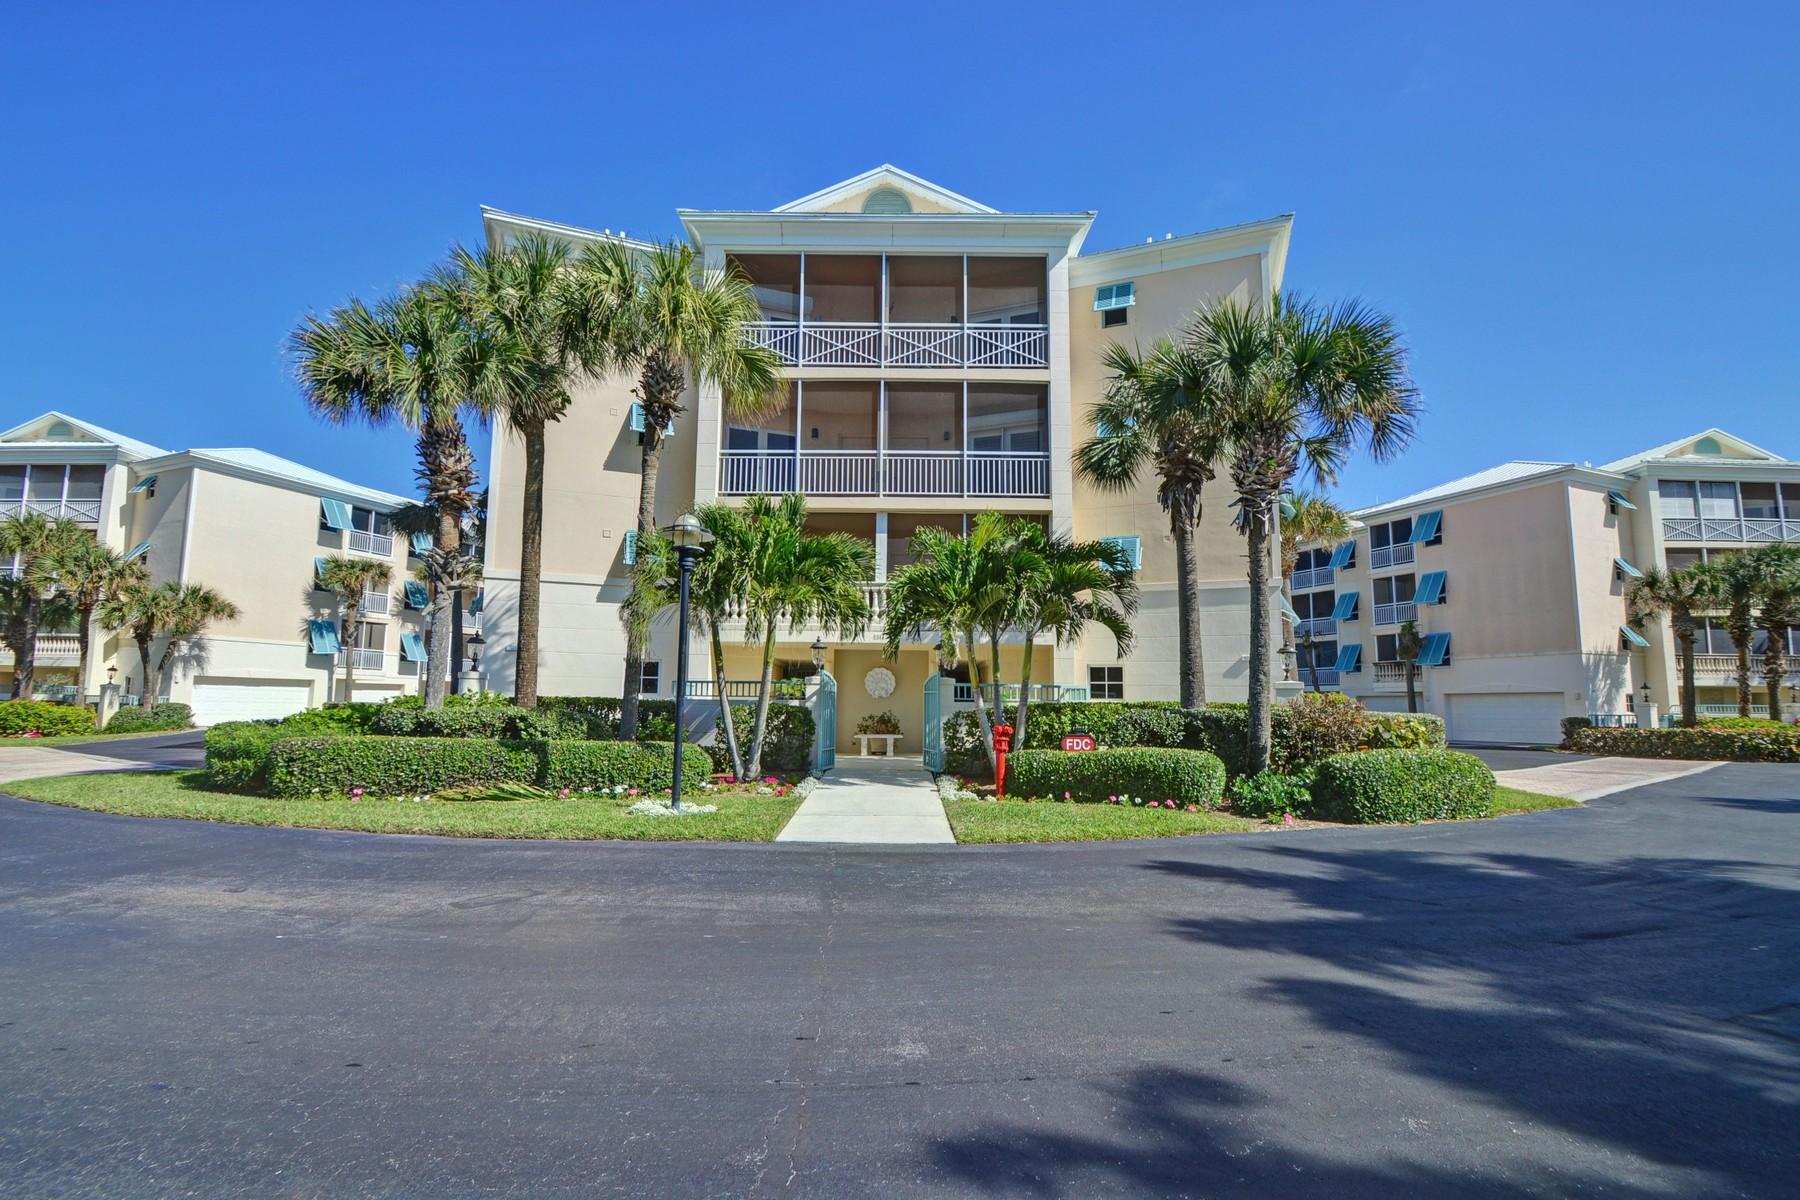 Copropriété pour l Vente à Stunning Oceanfront Condo in Sea Oaks 8814 S Sea Oaks Way # 301 Vero Beach, Florida 32963 États-Unis